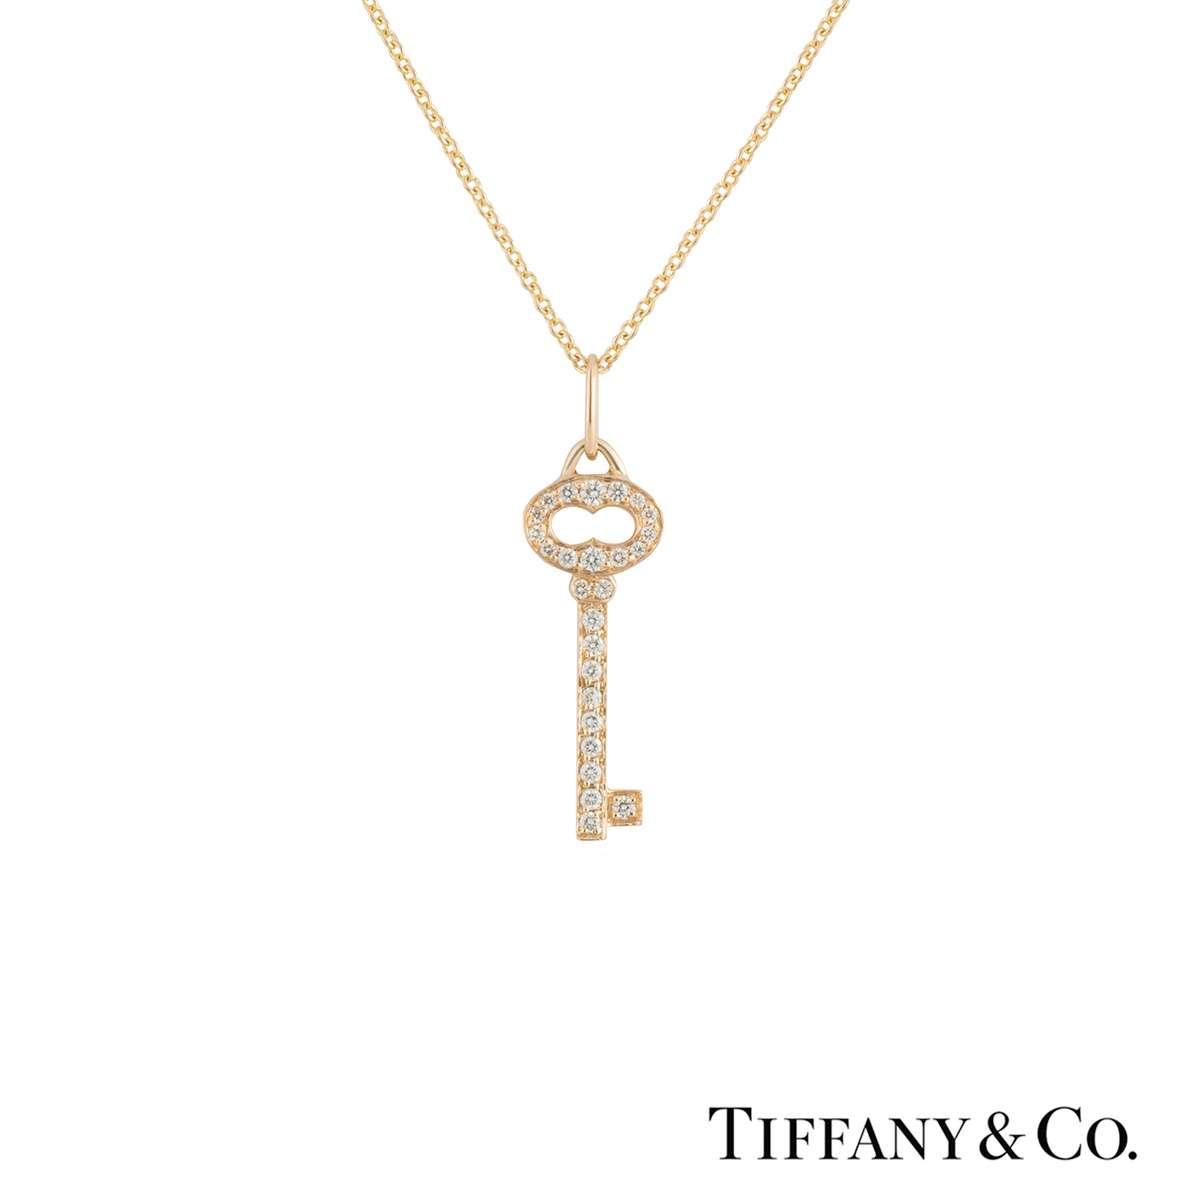 Tiffany & Co. Rose Gold Diamond Keys Pendant